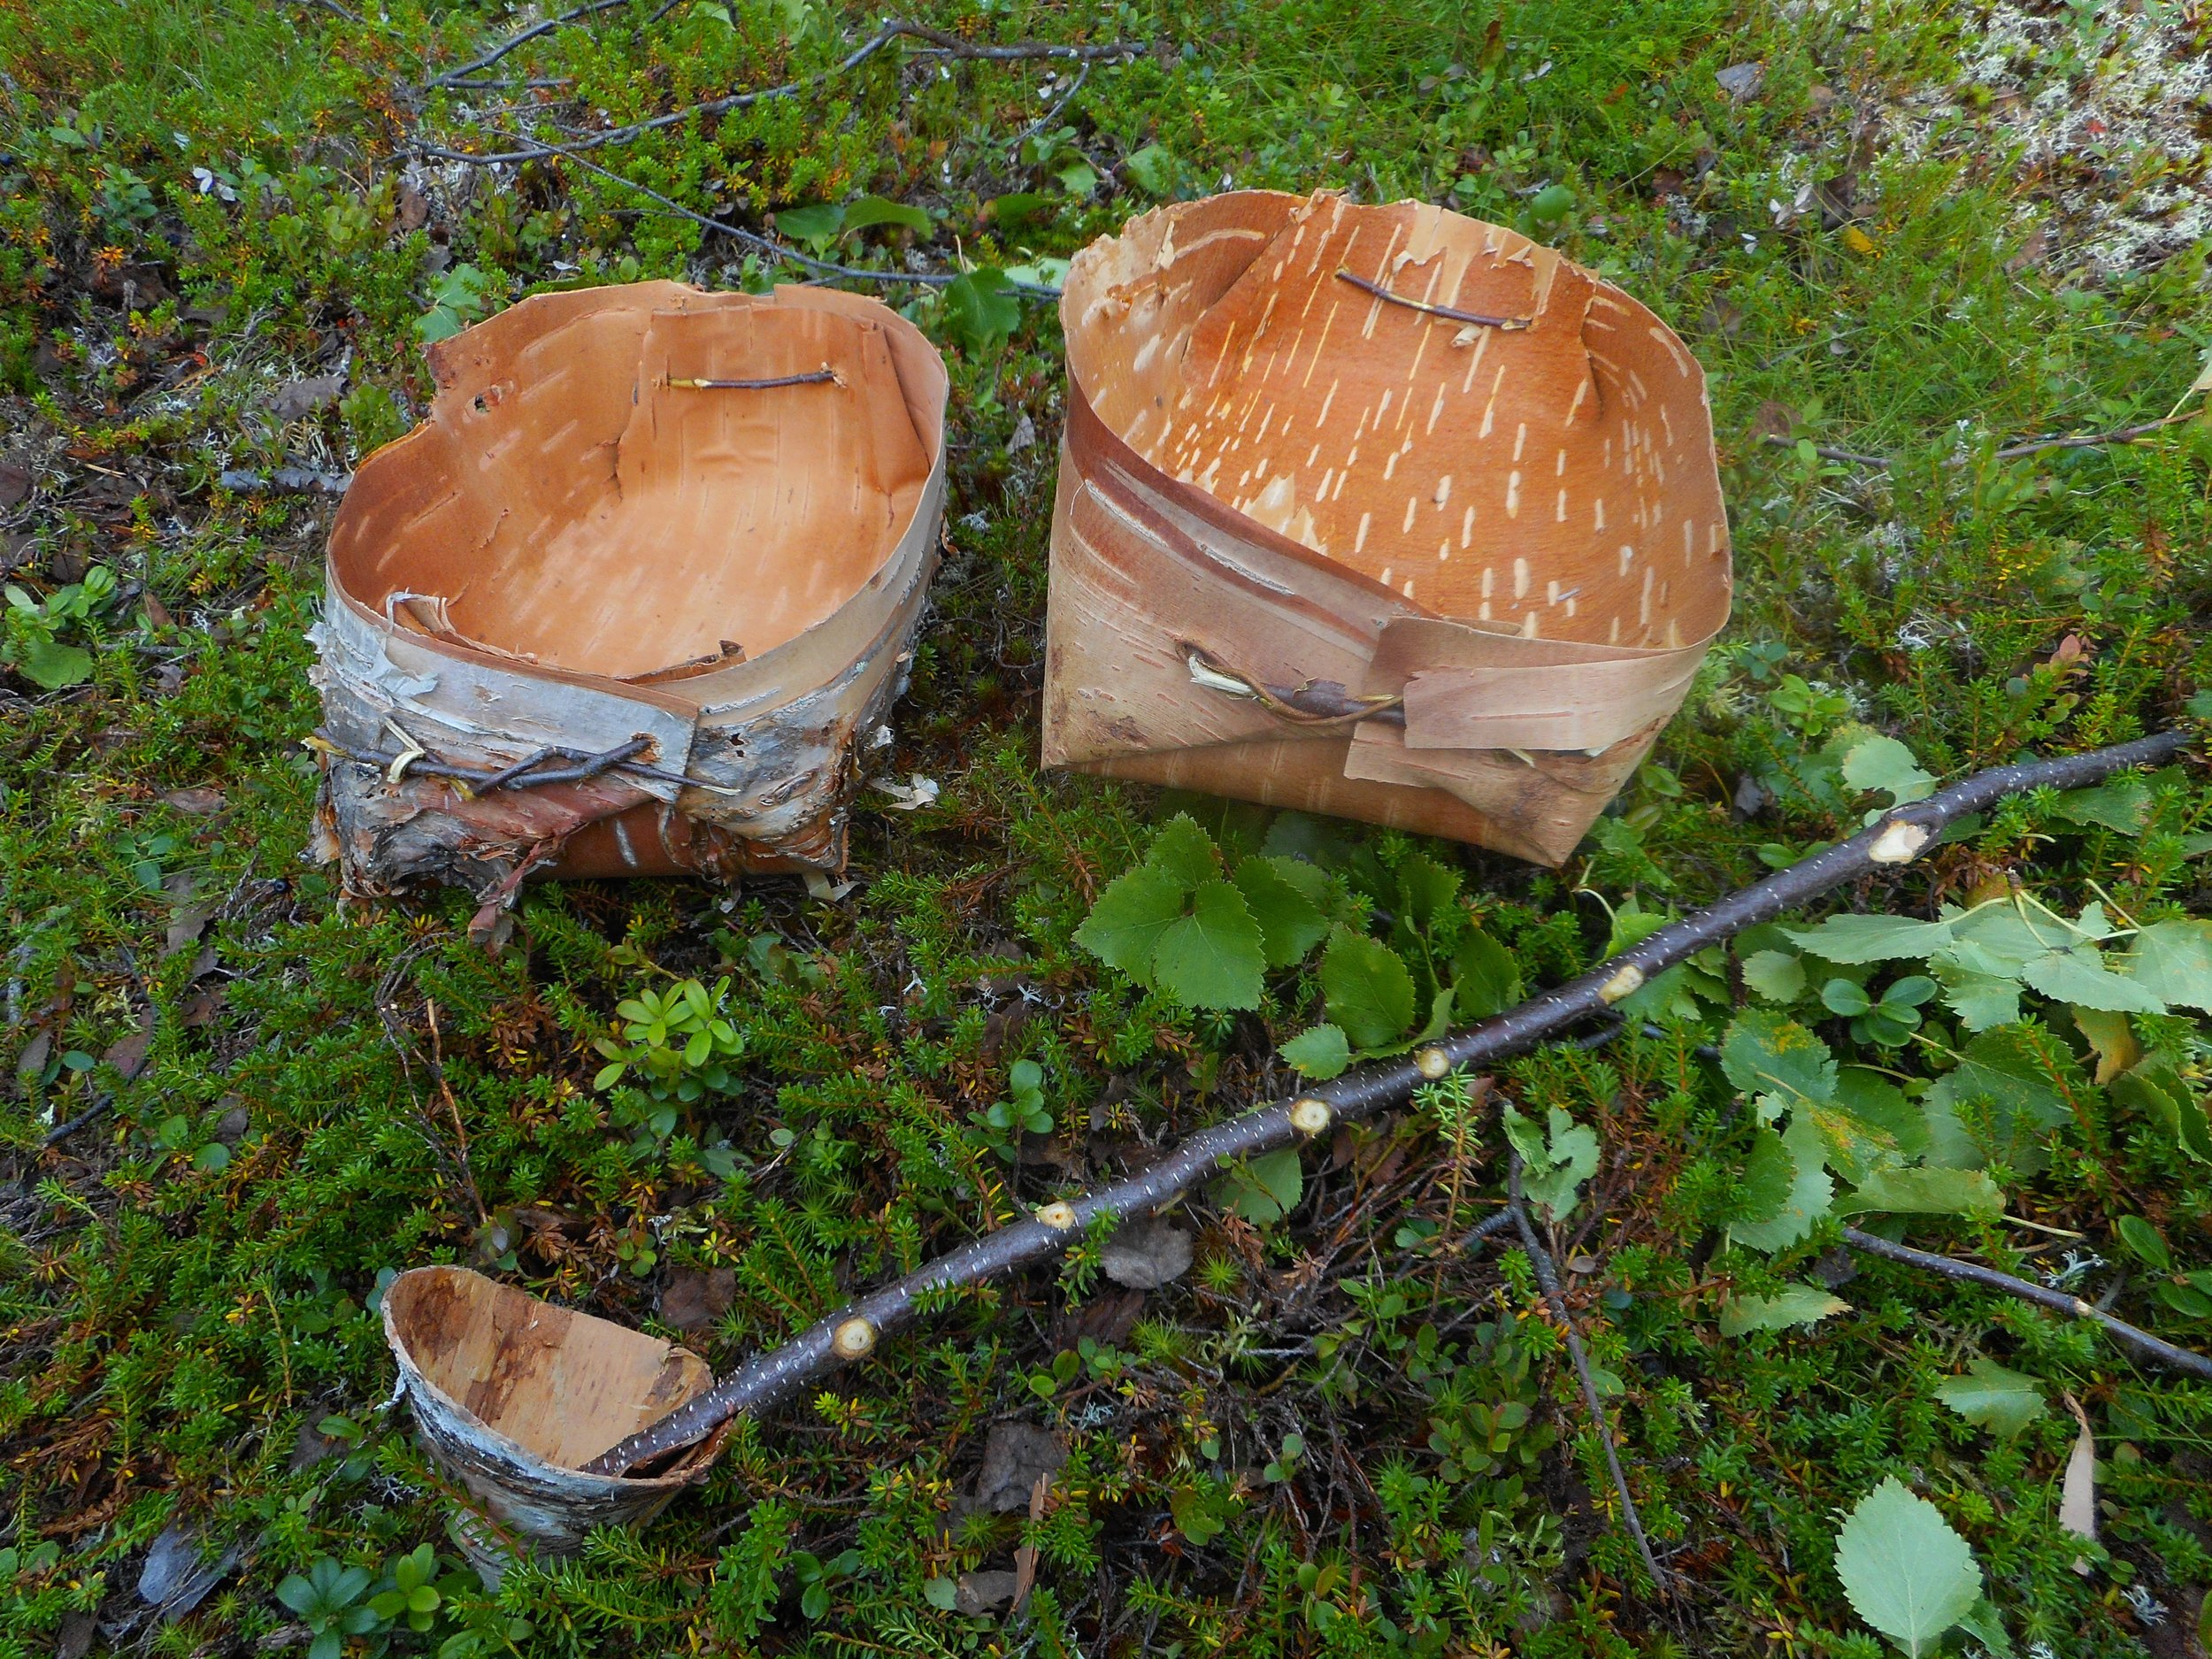 wooden handcraft old survival skills in Finland